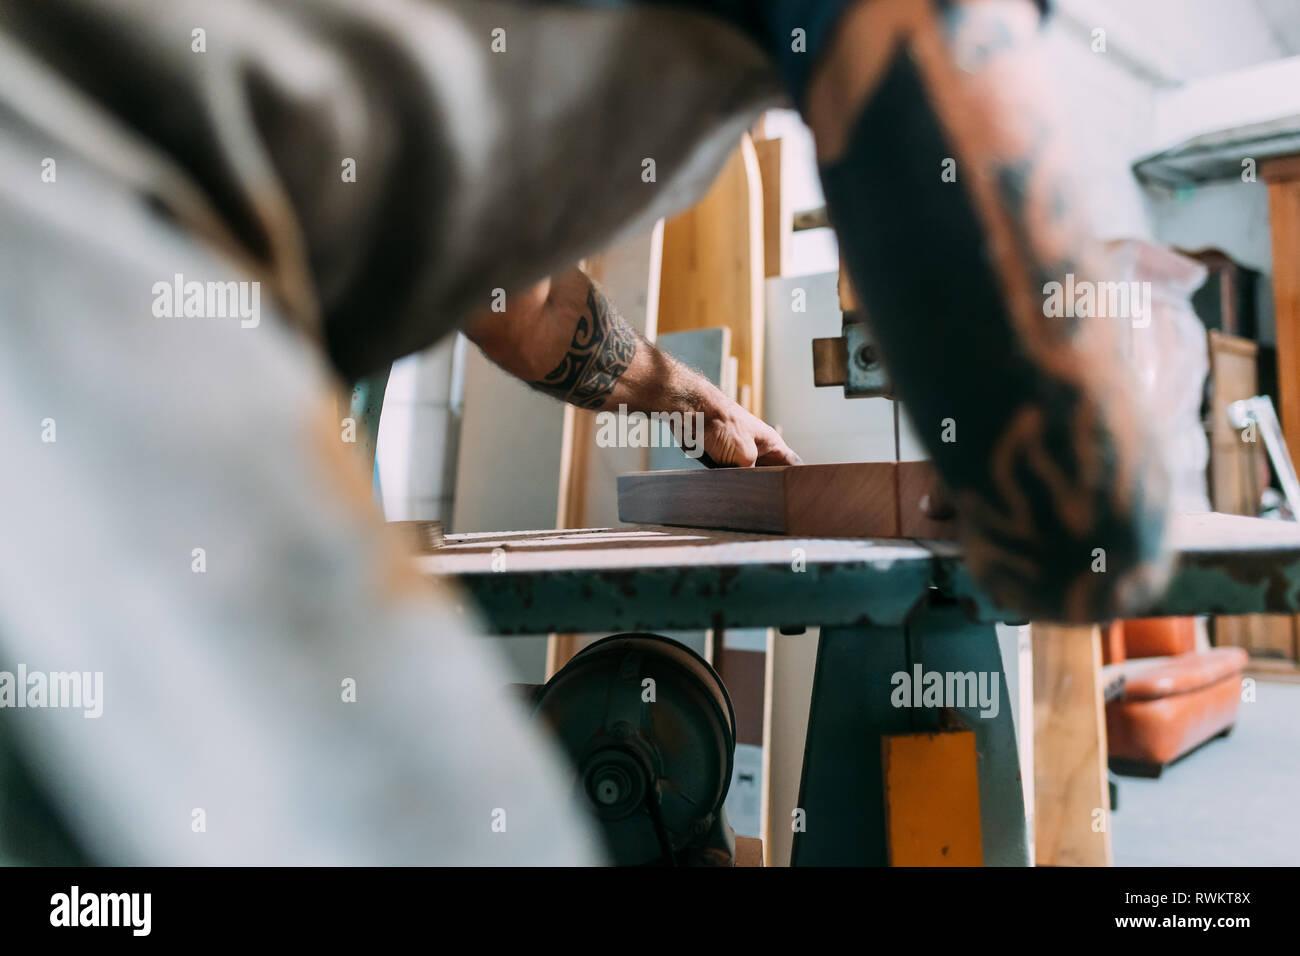 Ax trabaja en madera para ax mango en taller Foto de stock